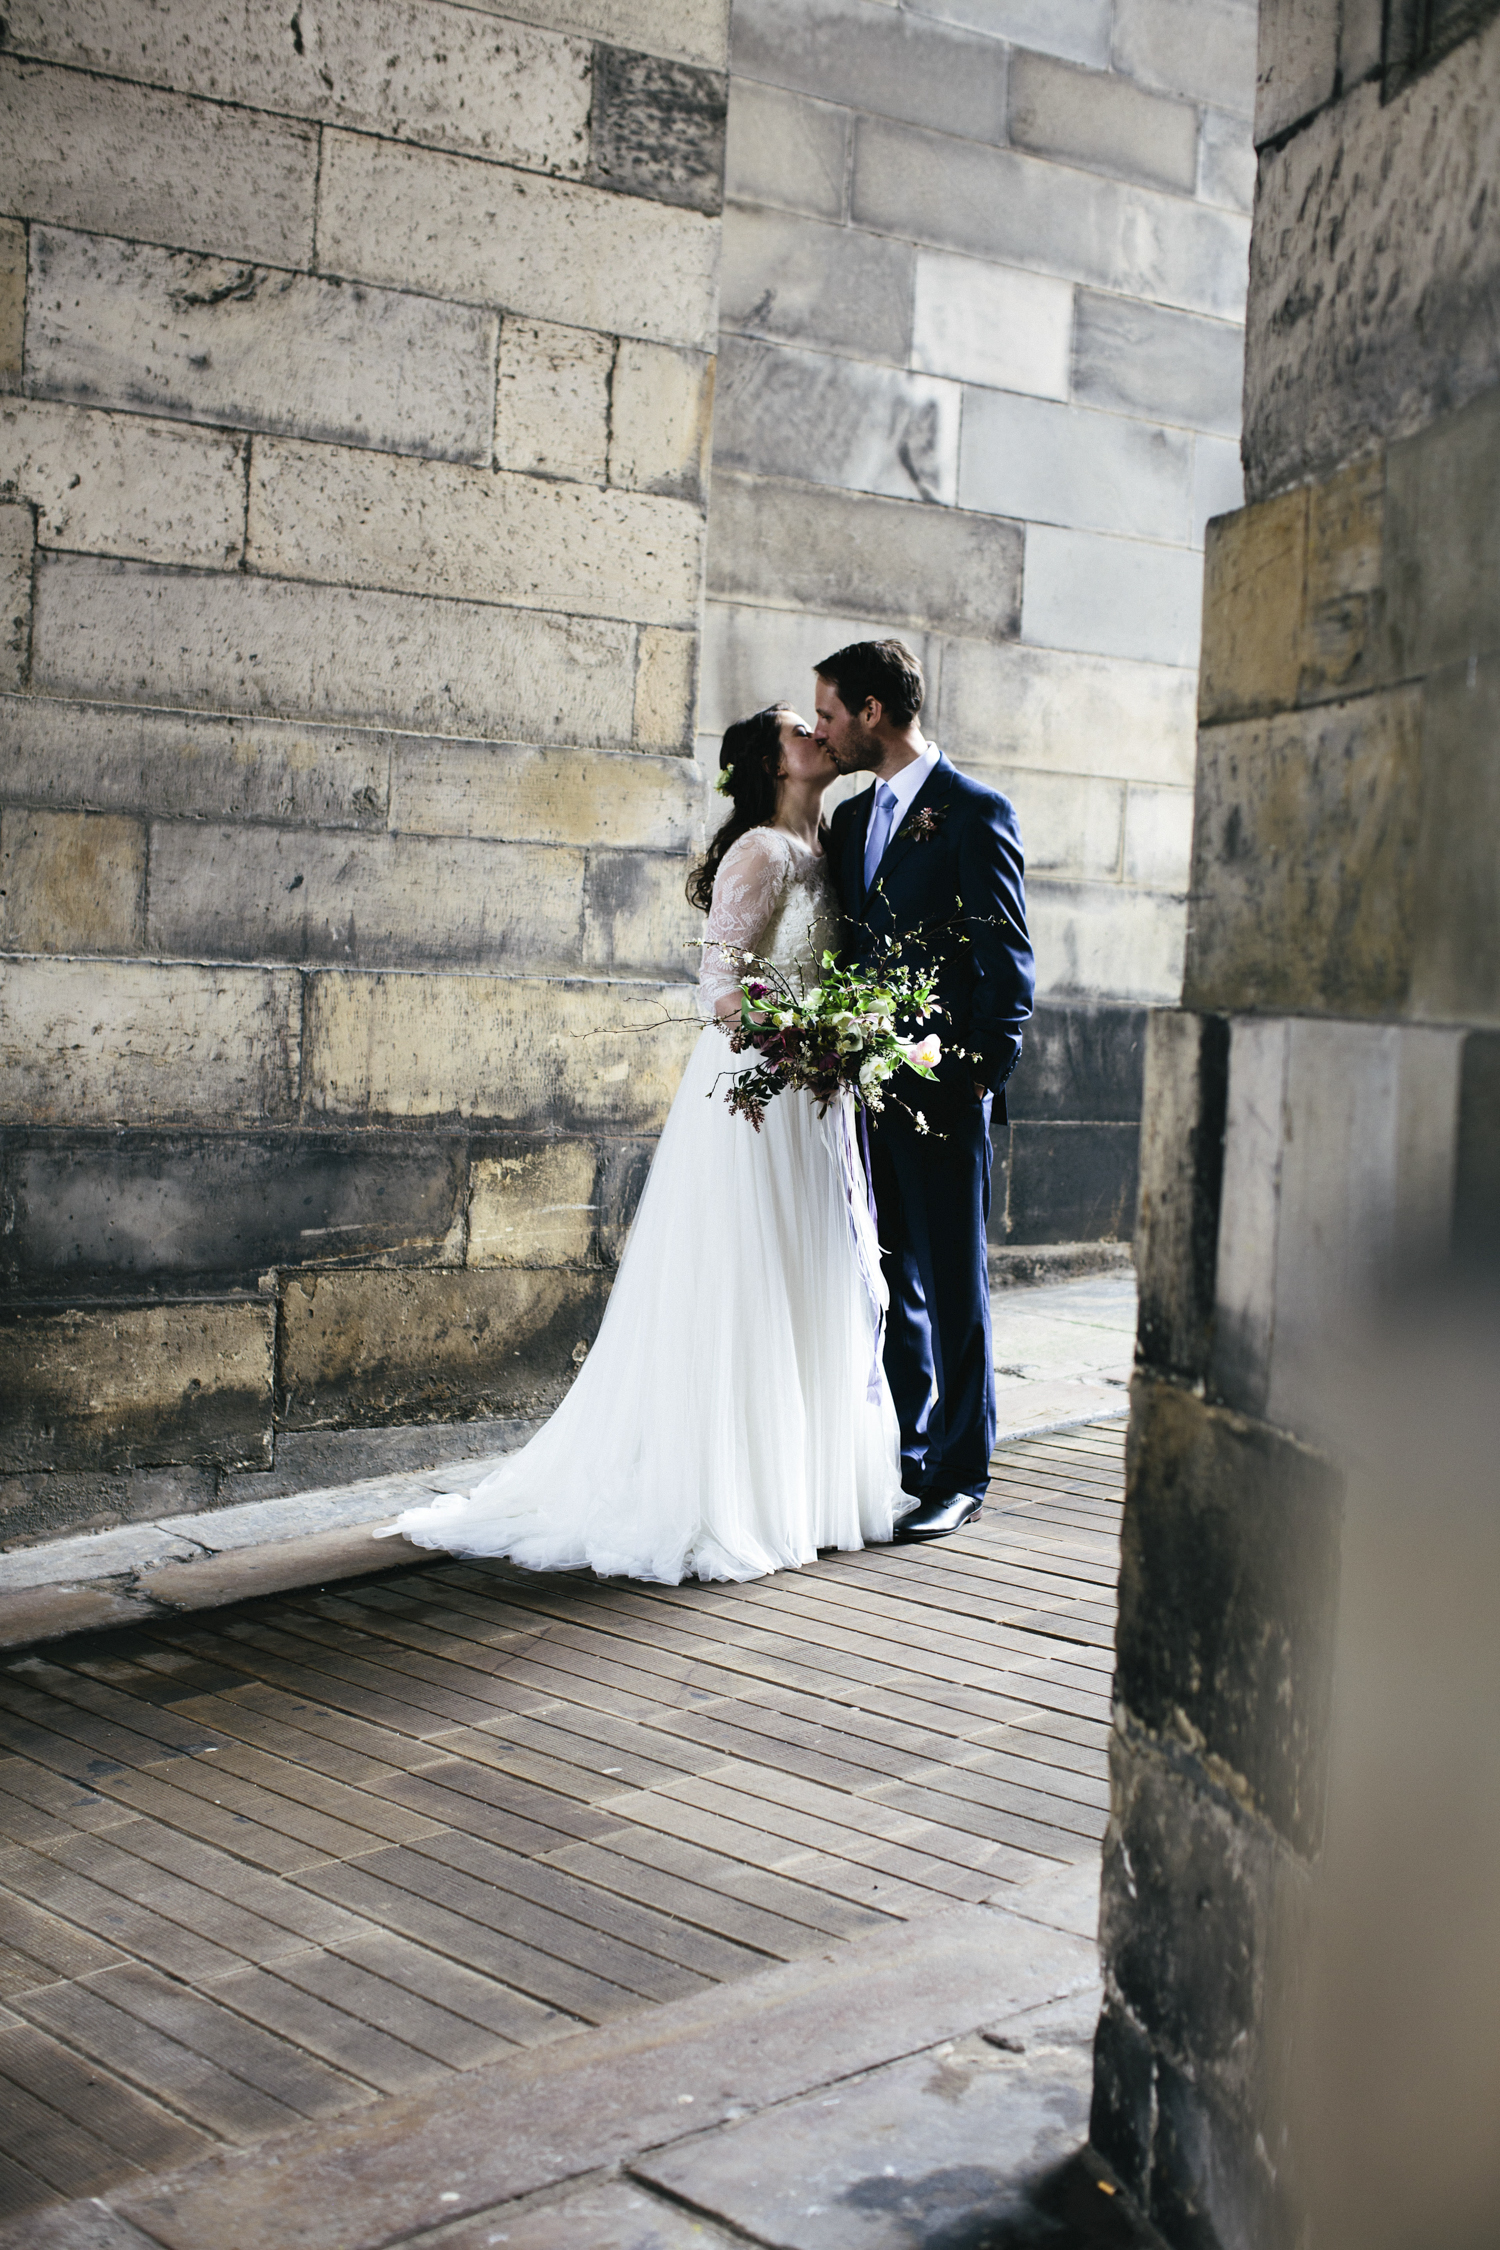 Quirky Wedding Photography Edinburgh Dovecot Studios 073.jpg